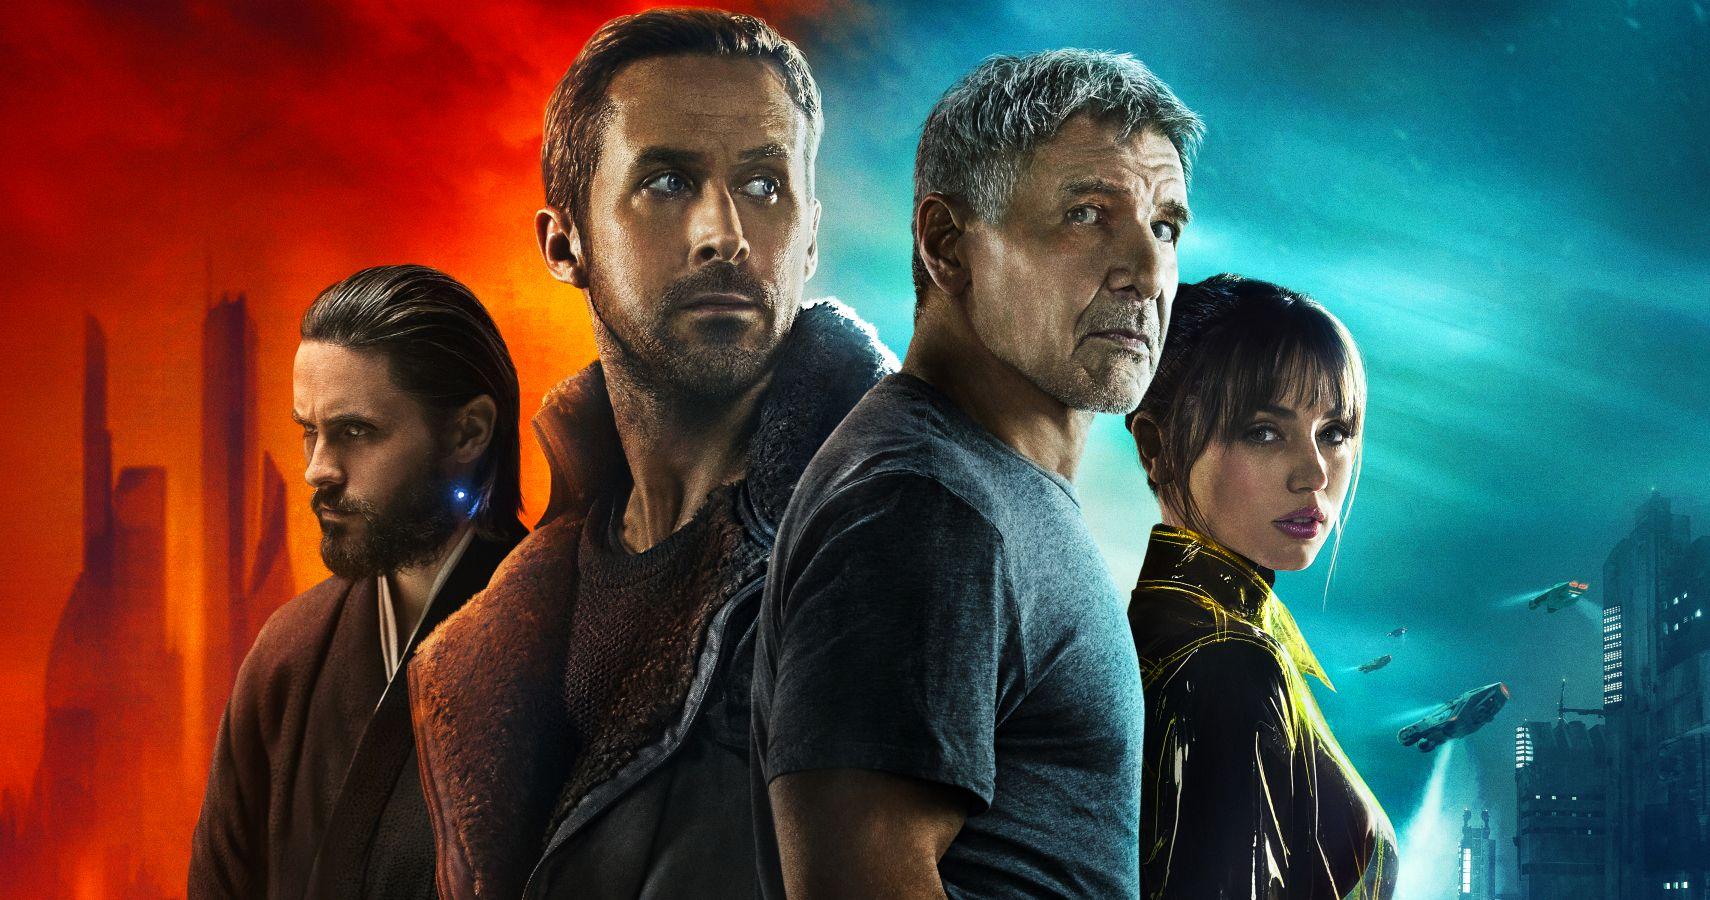 Blade Runner 2049 Sequel